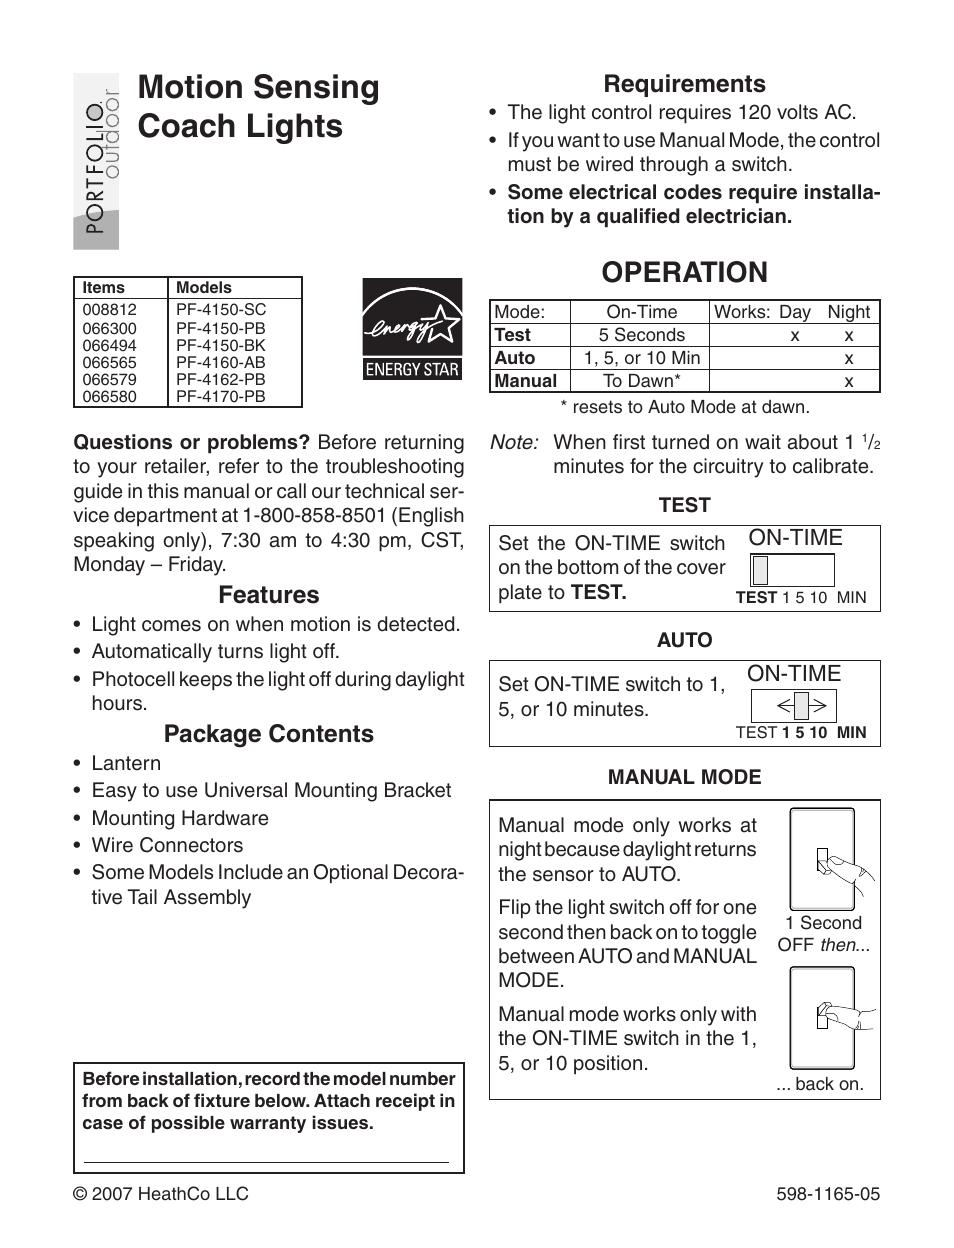 heath zenith pf 4160 ab user manual 24 pages also for pf 4170 rh manualsdir com Heath Zenith Wired Door Chime Heath Zenith Support